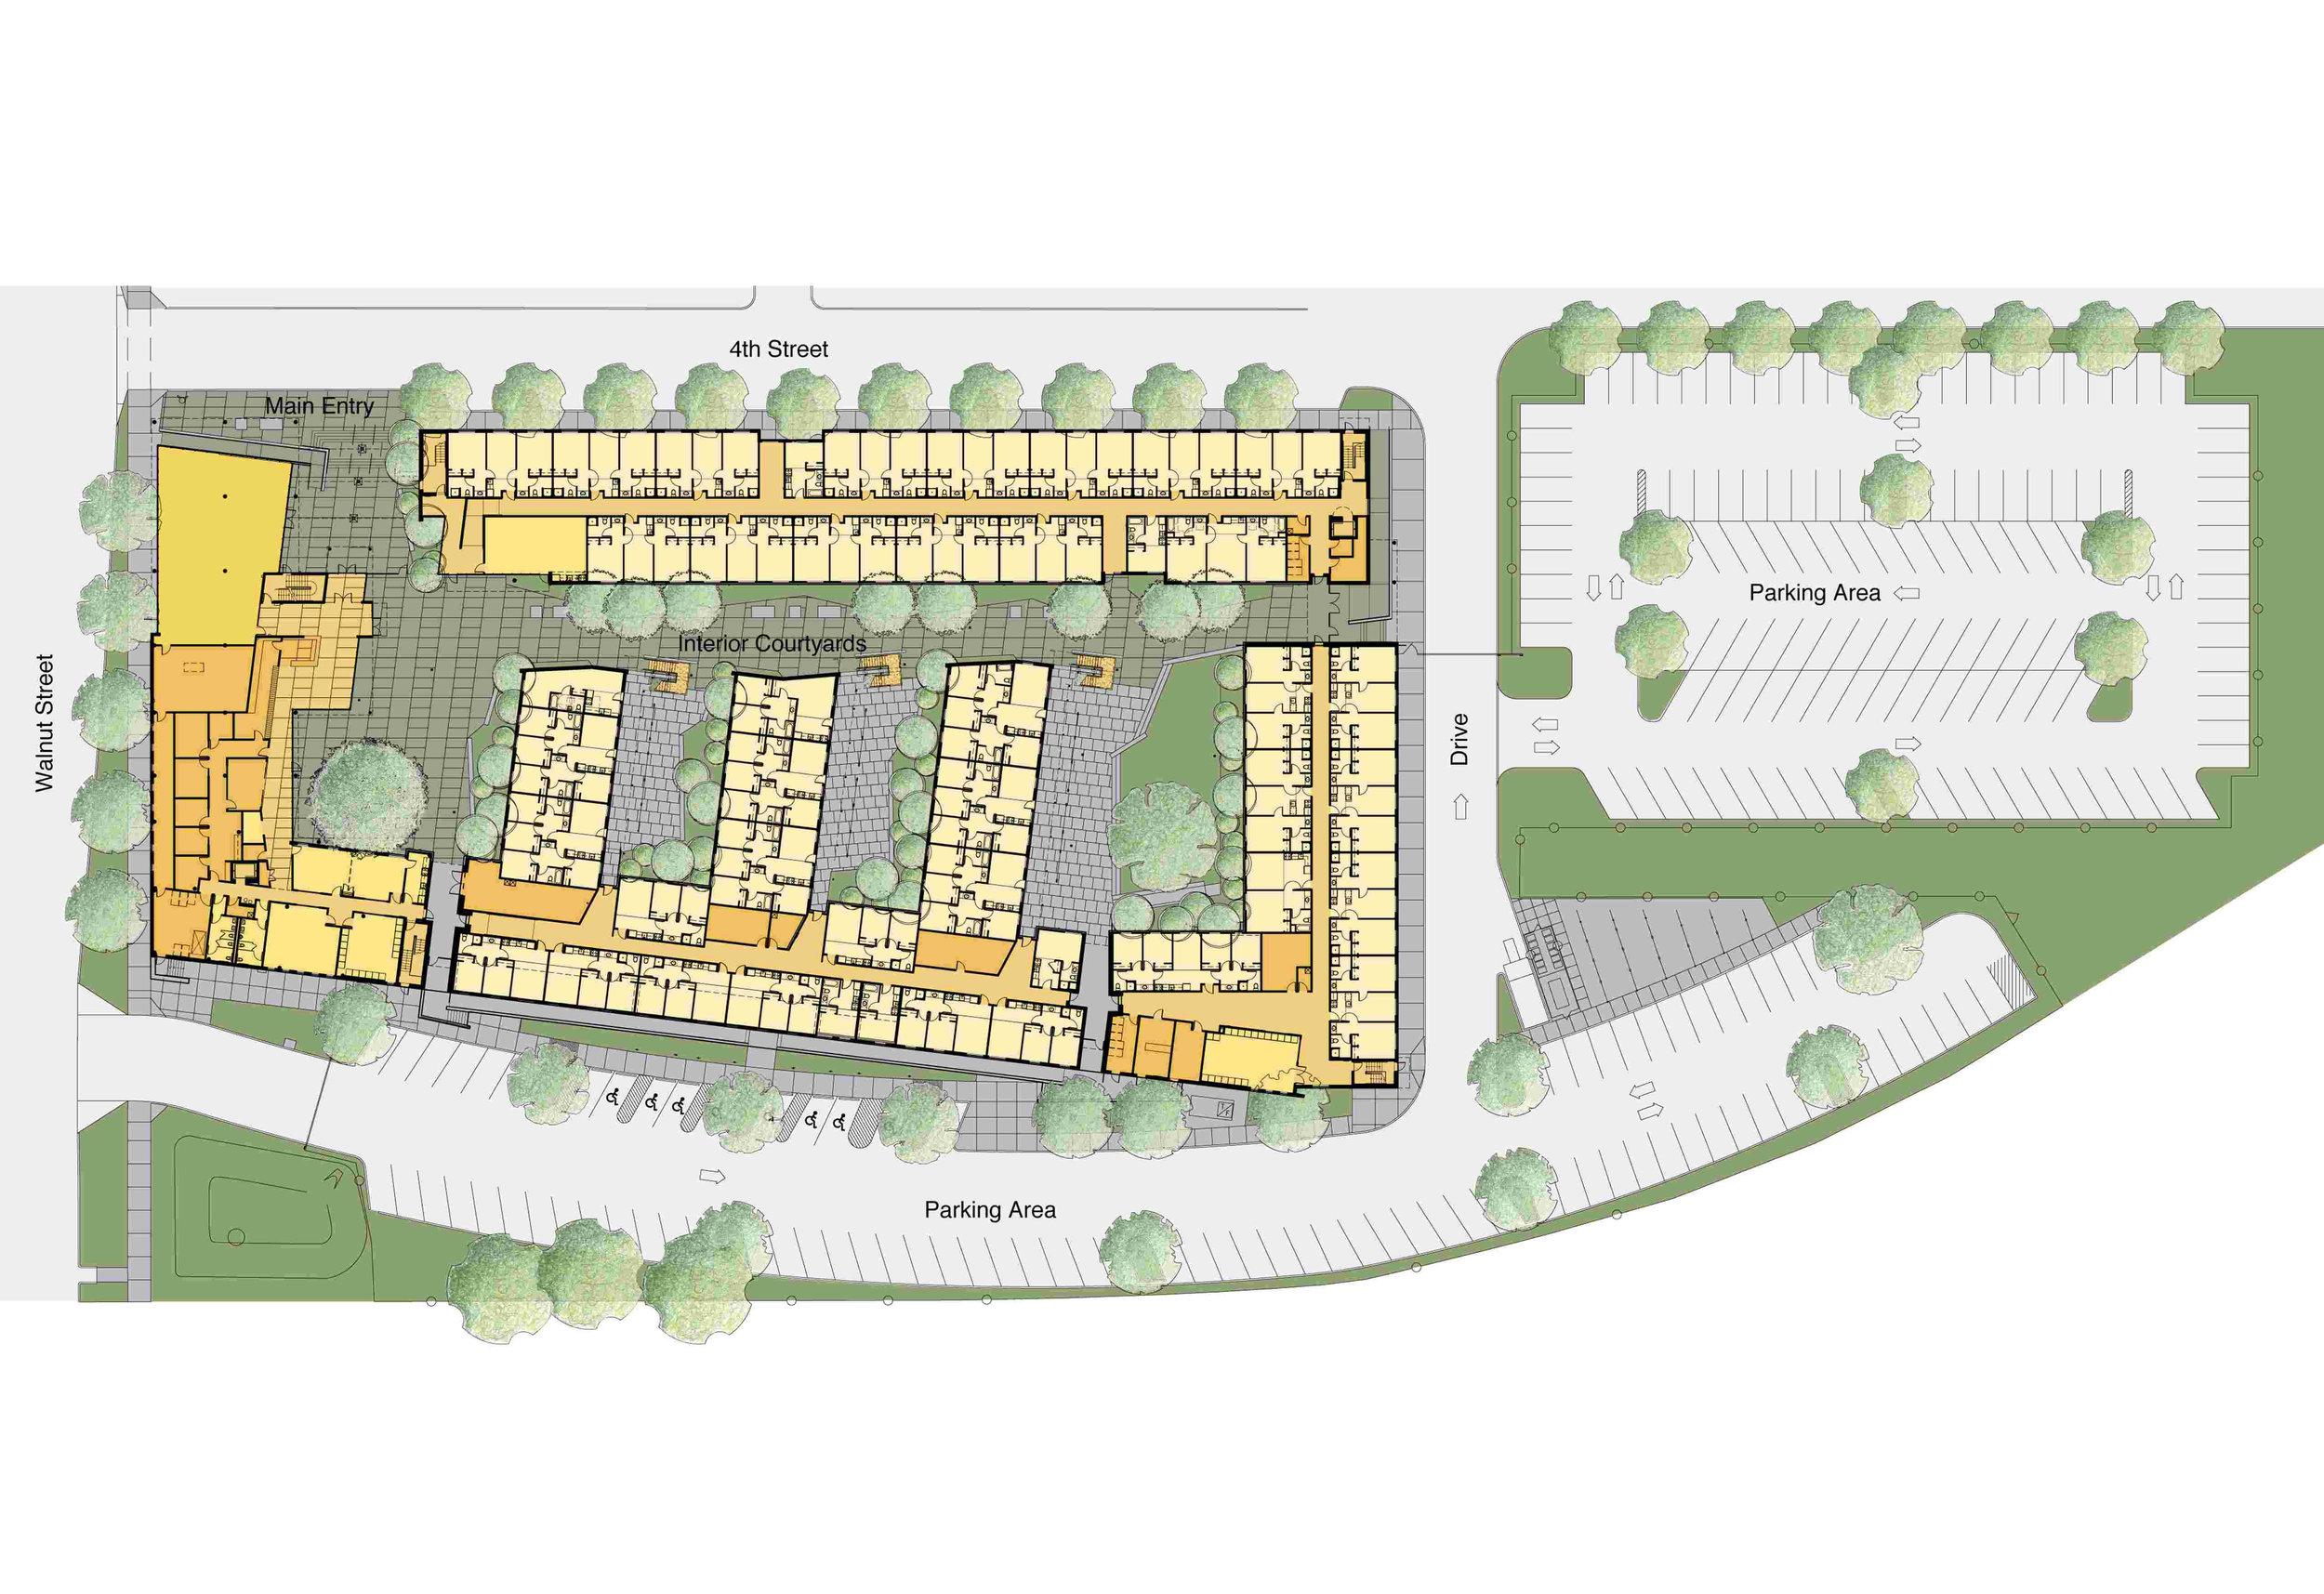 Campus village apartments Site Plan Resized.jpg